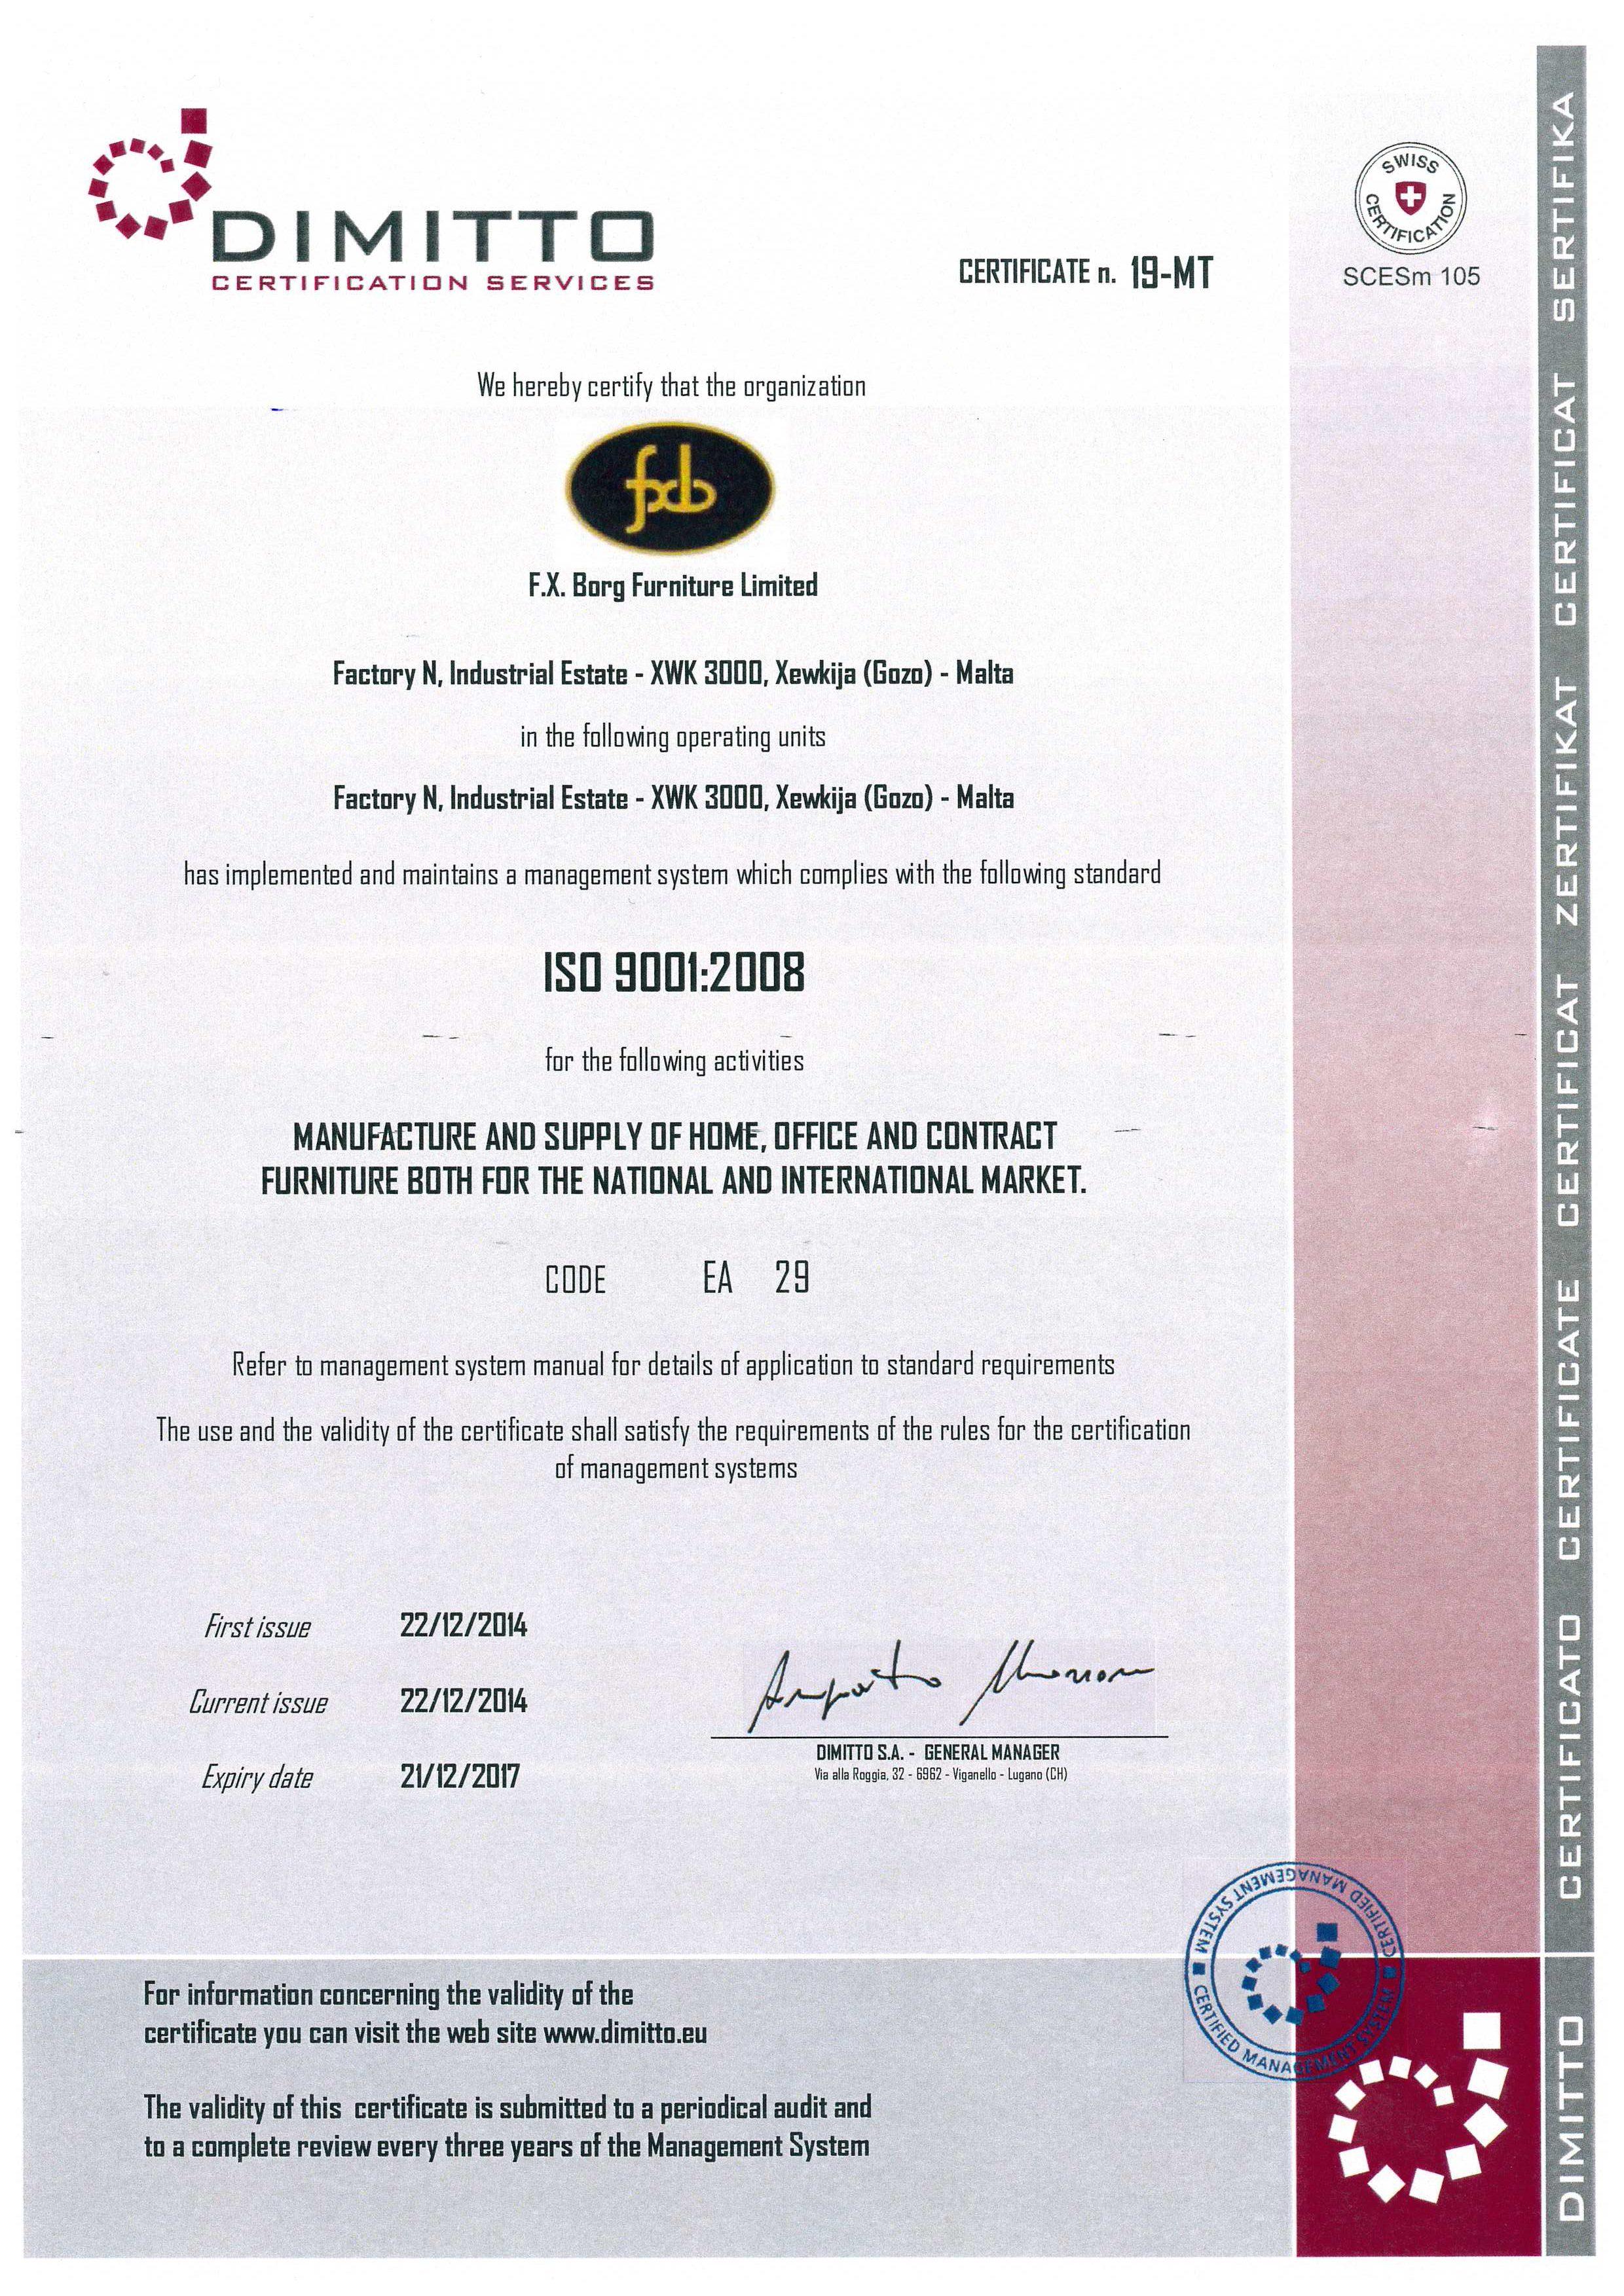 Manufacturing fxb certification msa en iso 9001 2008 xflitez Choice Image